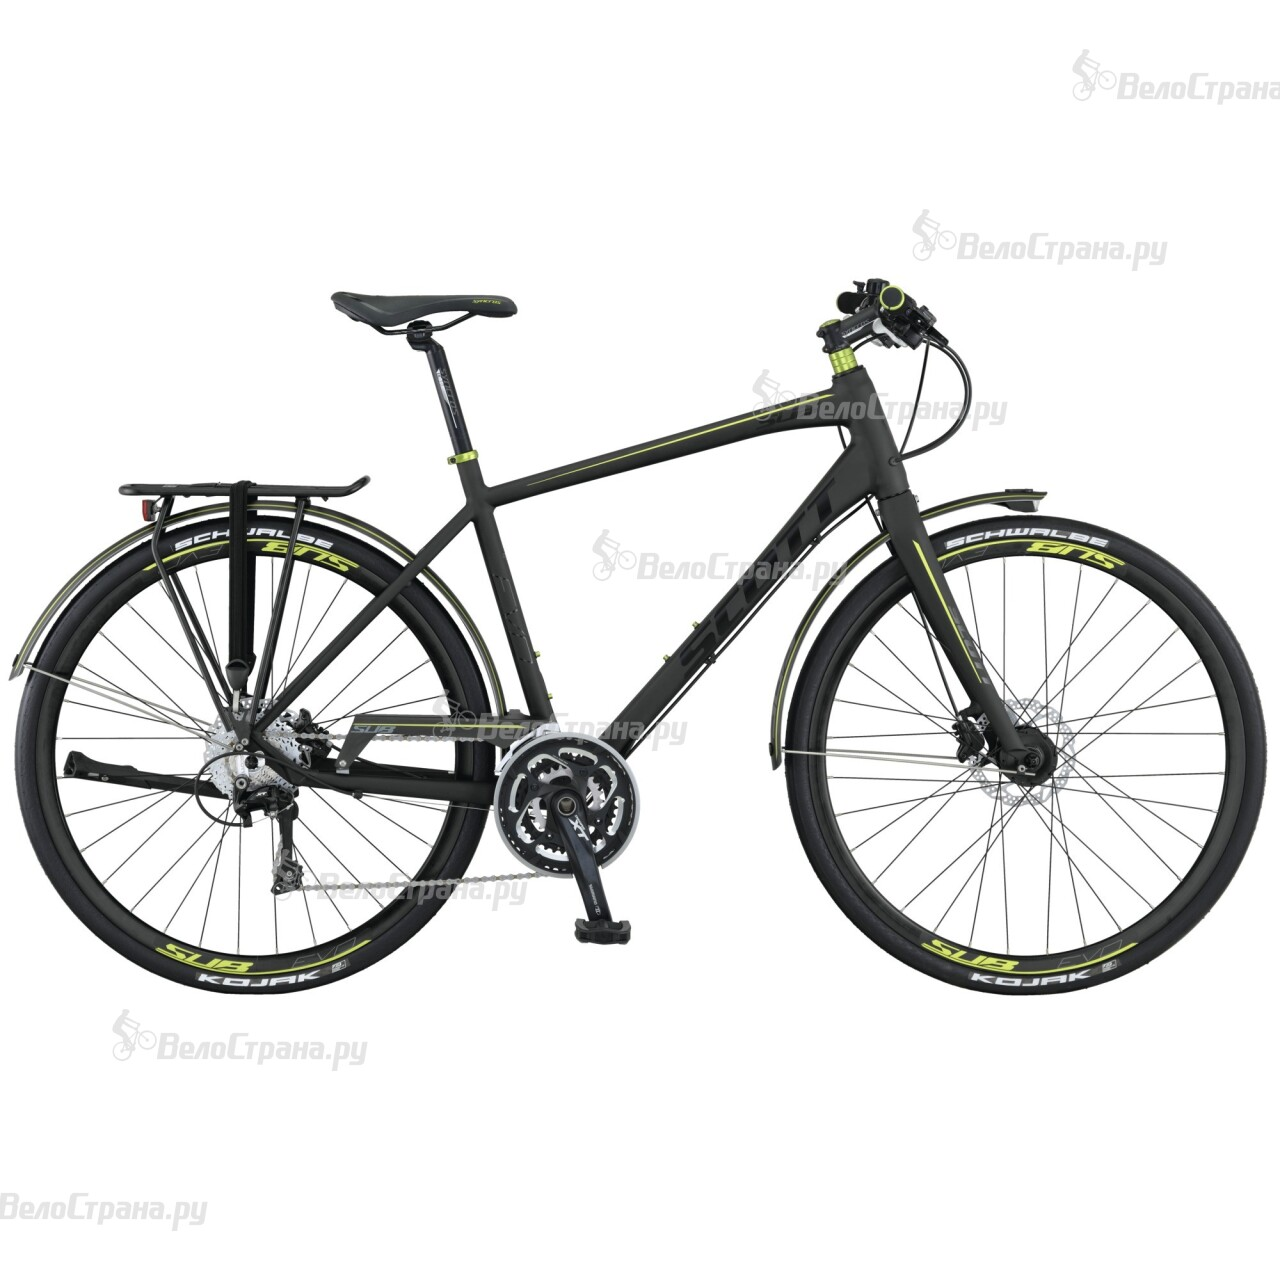 Велосипед Scott Sub Evo 20 (2015)